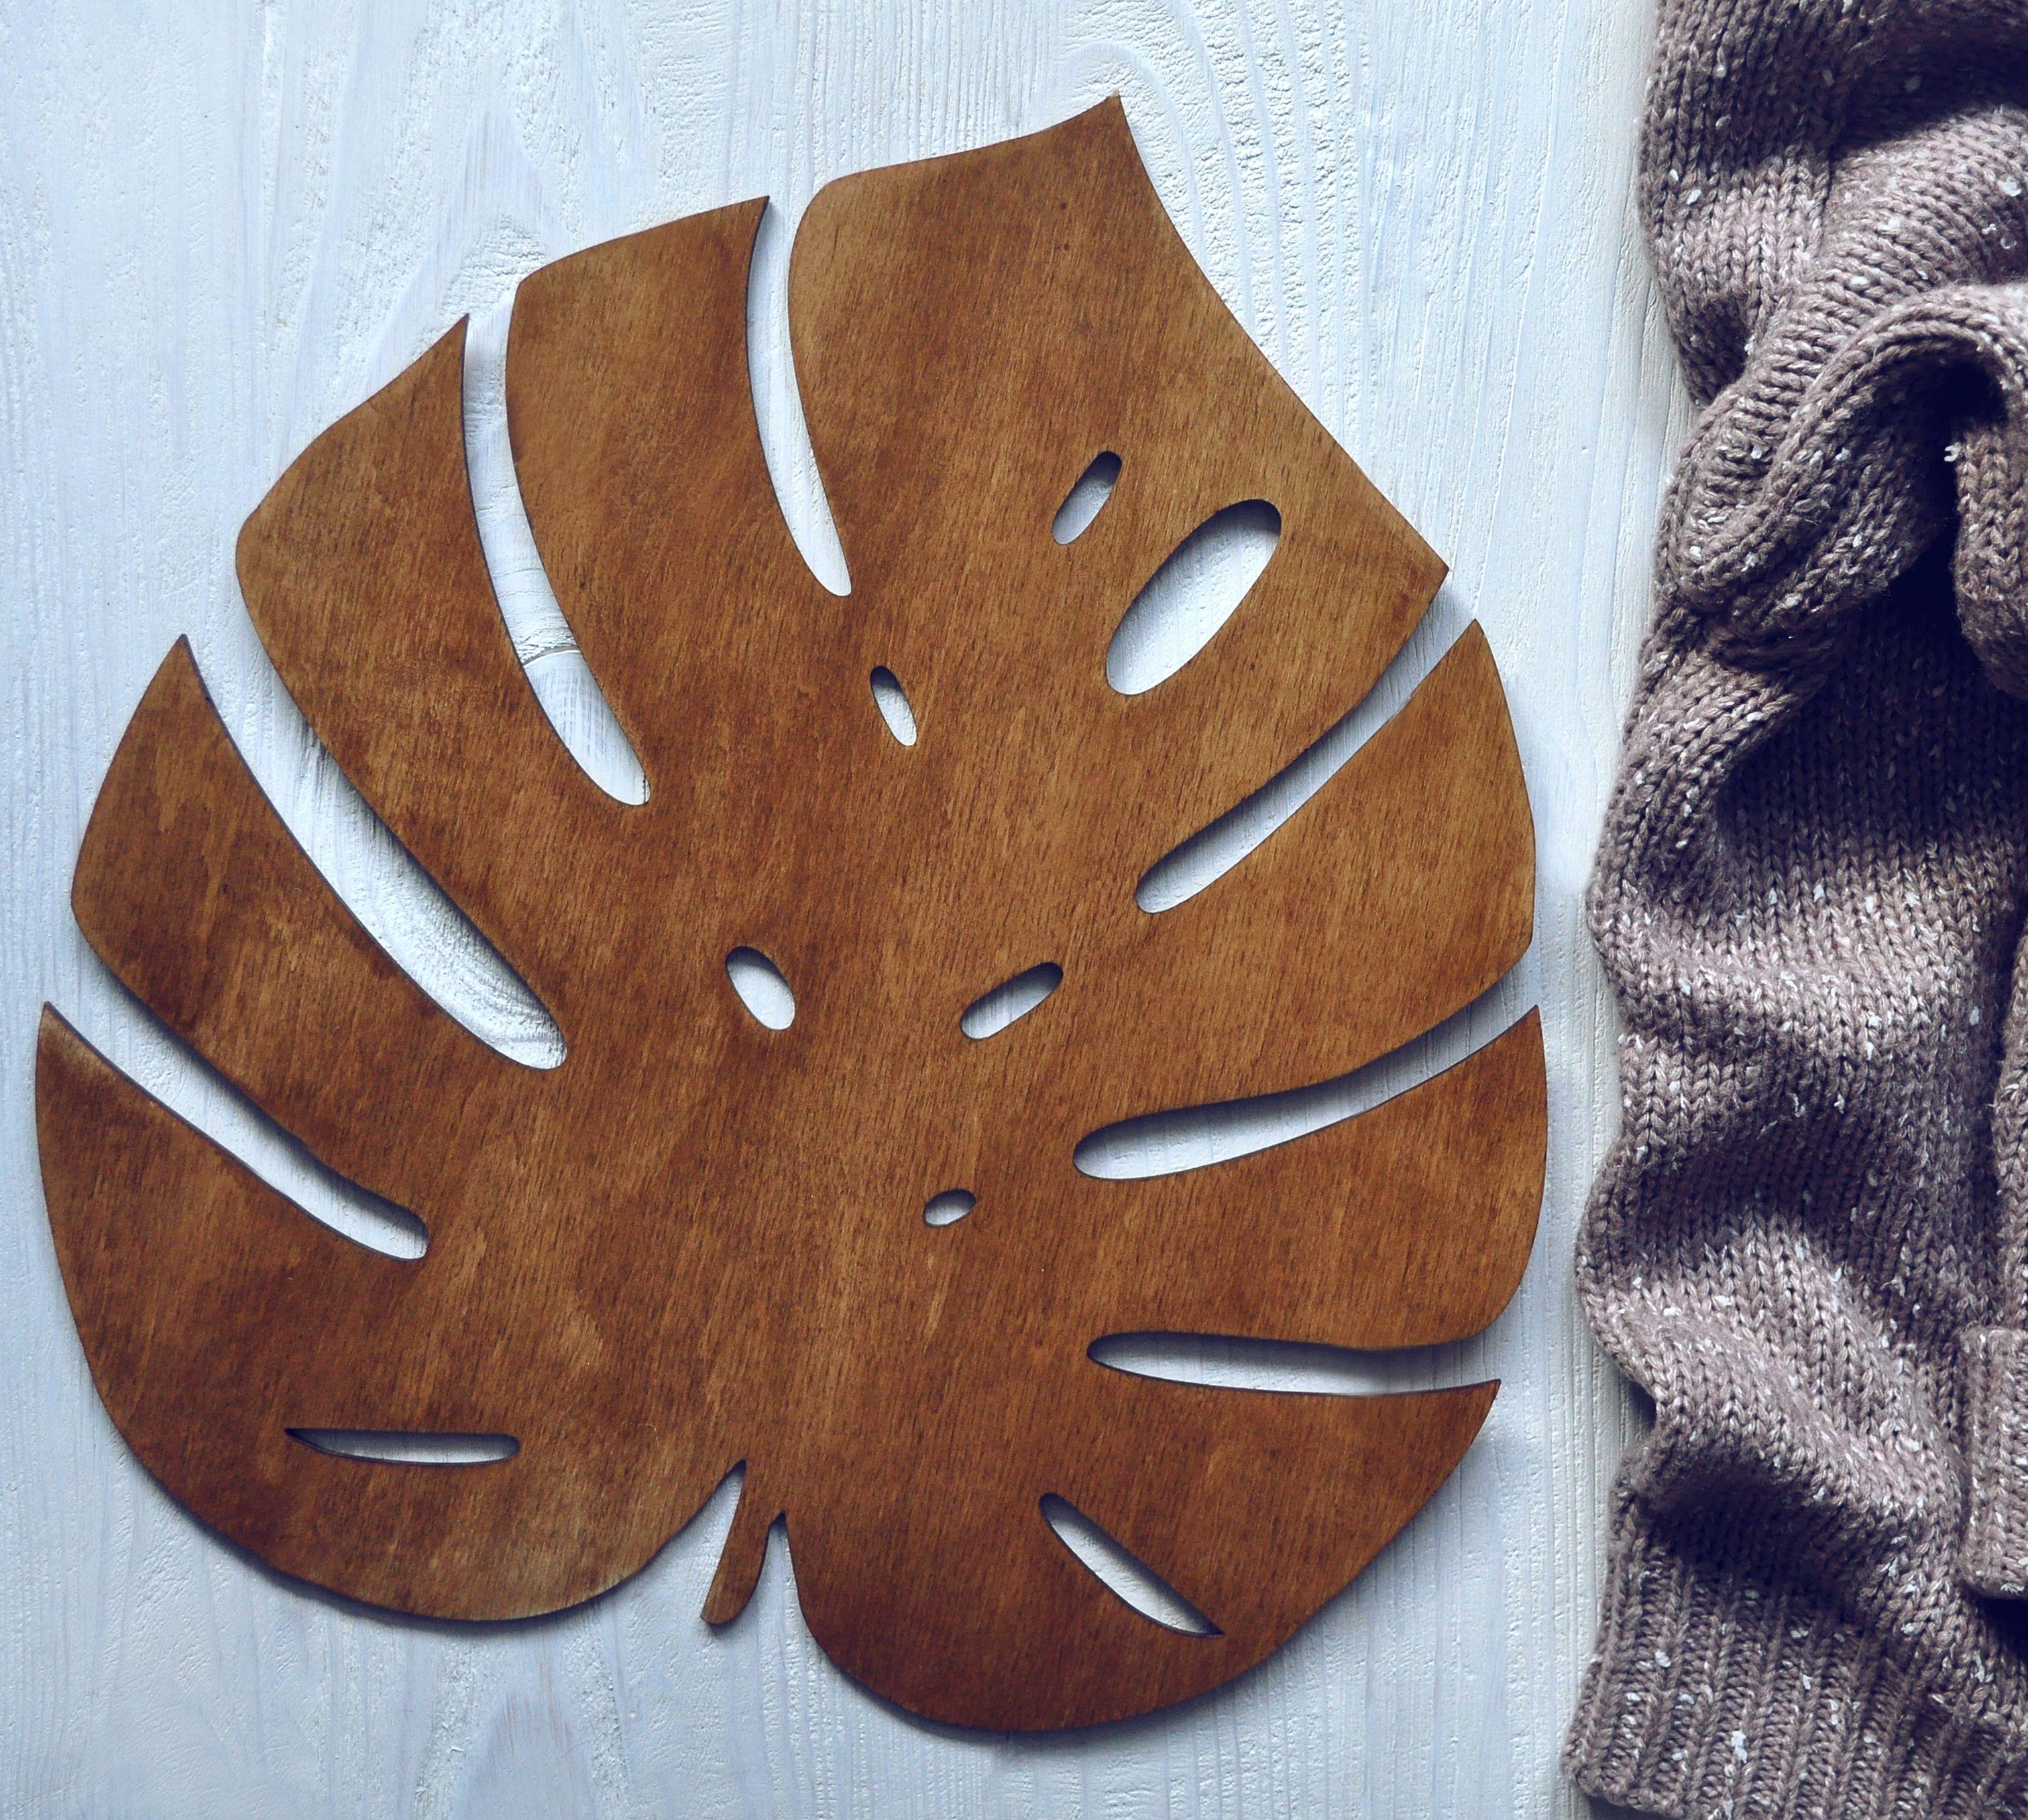 Wooden Rustic Place Mat Handmade Nature Decor For Wedding Etsy Placemats Handmade Natural Handmade